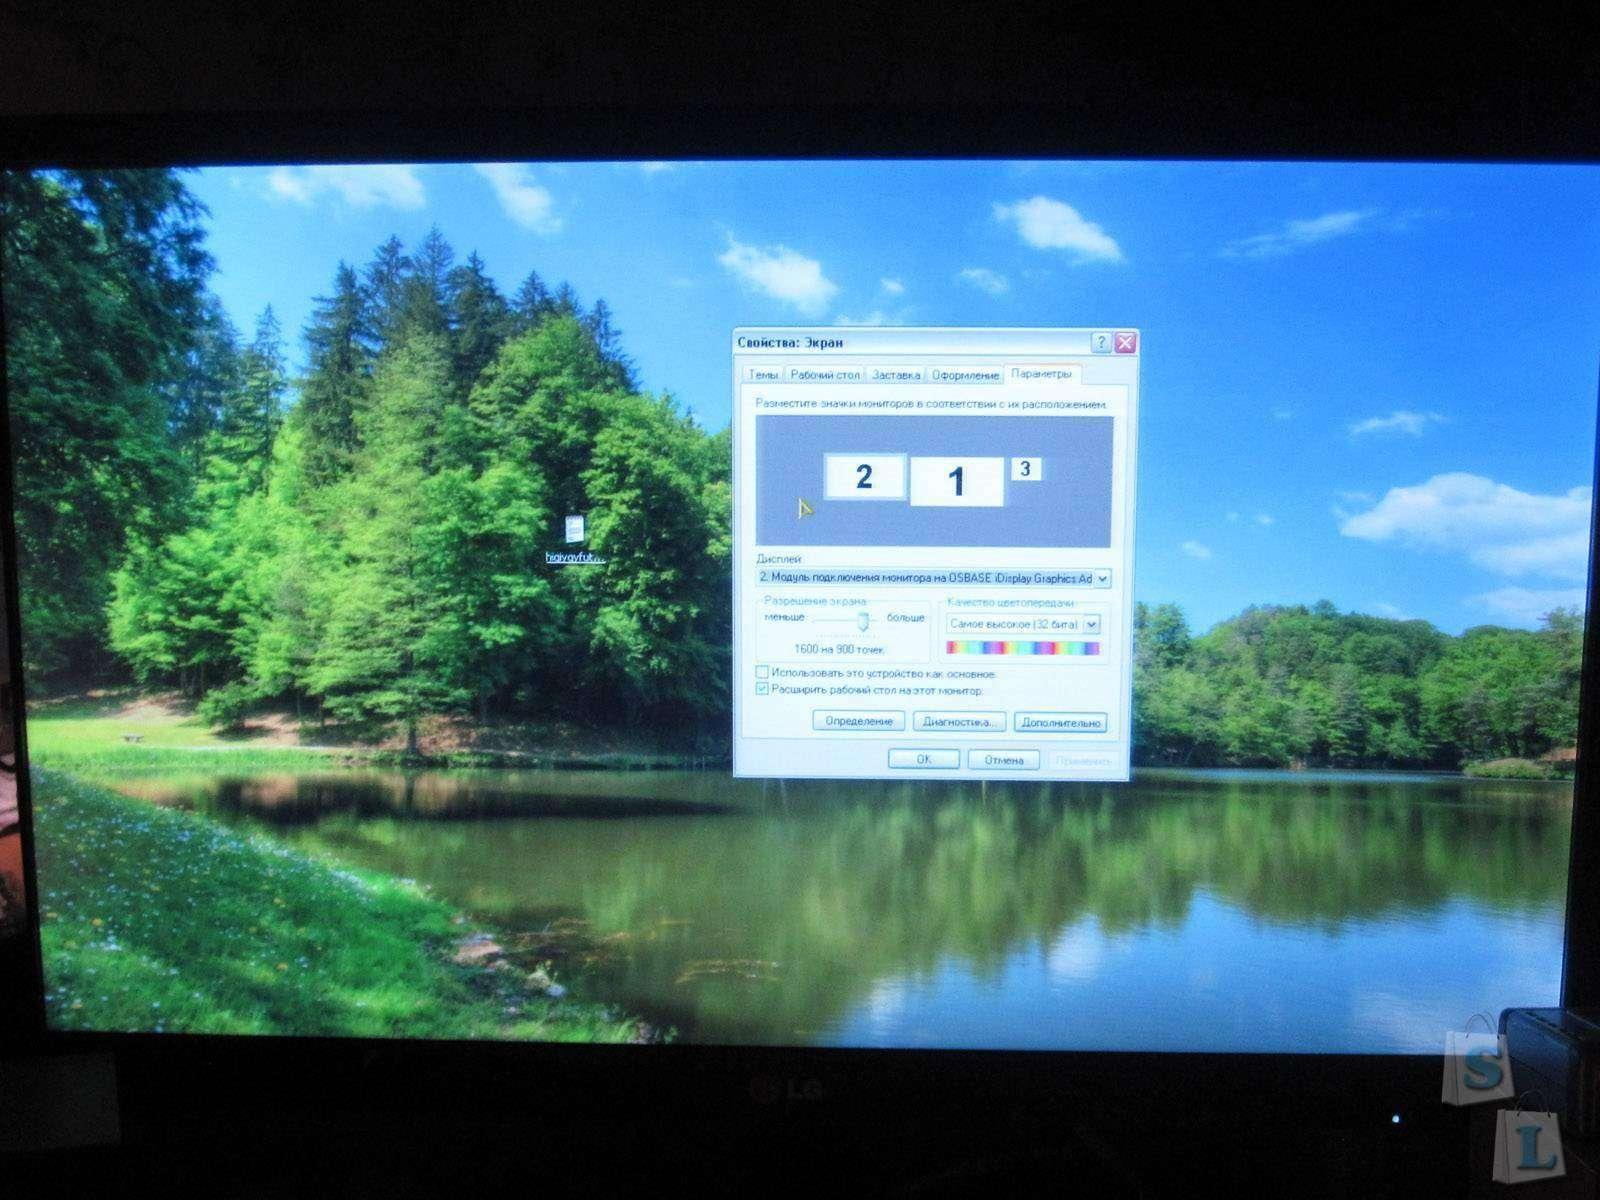 GearBest: USB видеоадаптер, ну или почти видеокарта.